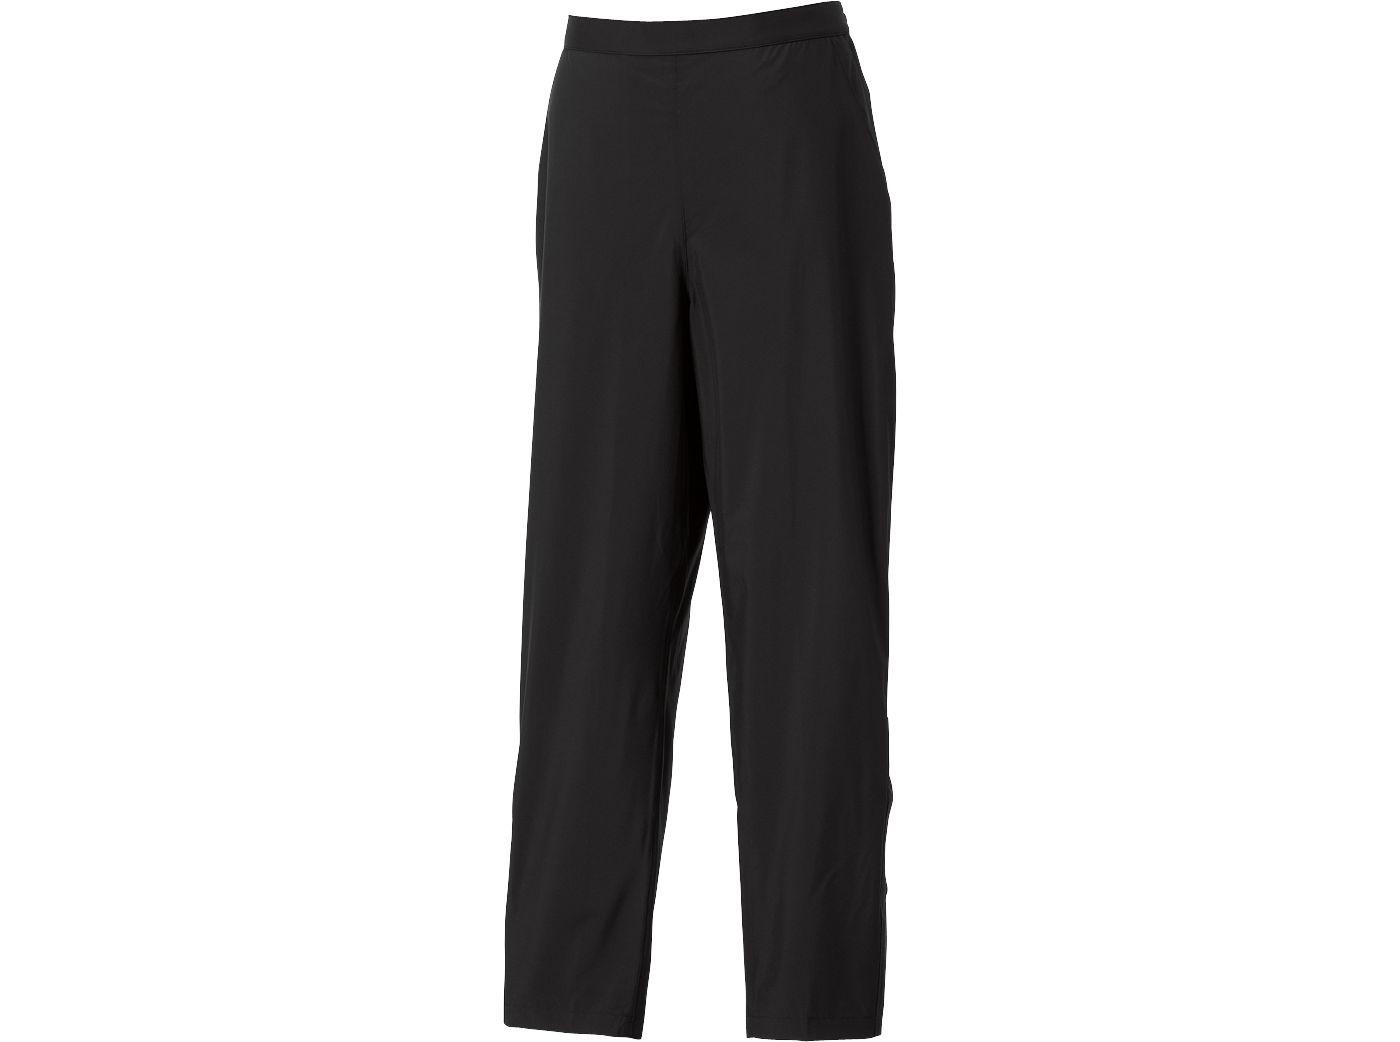 FootJoy Women's Performance Light Pants